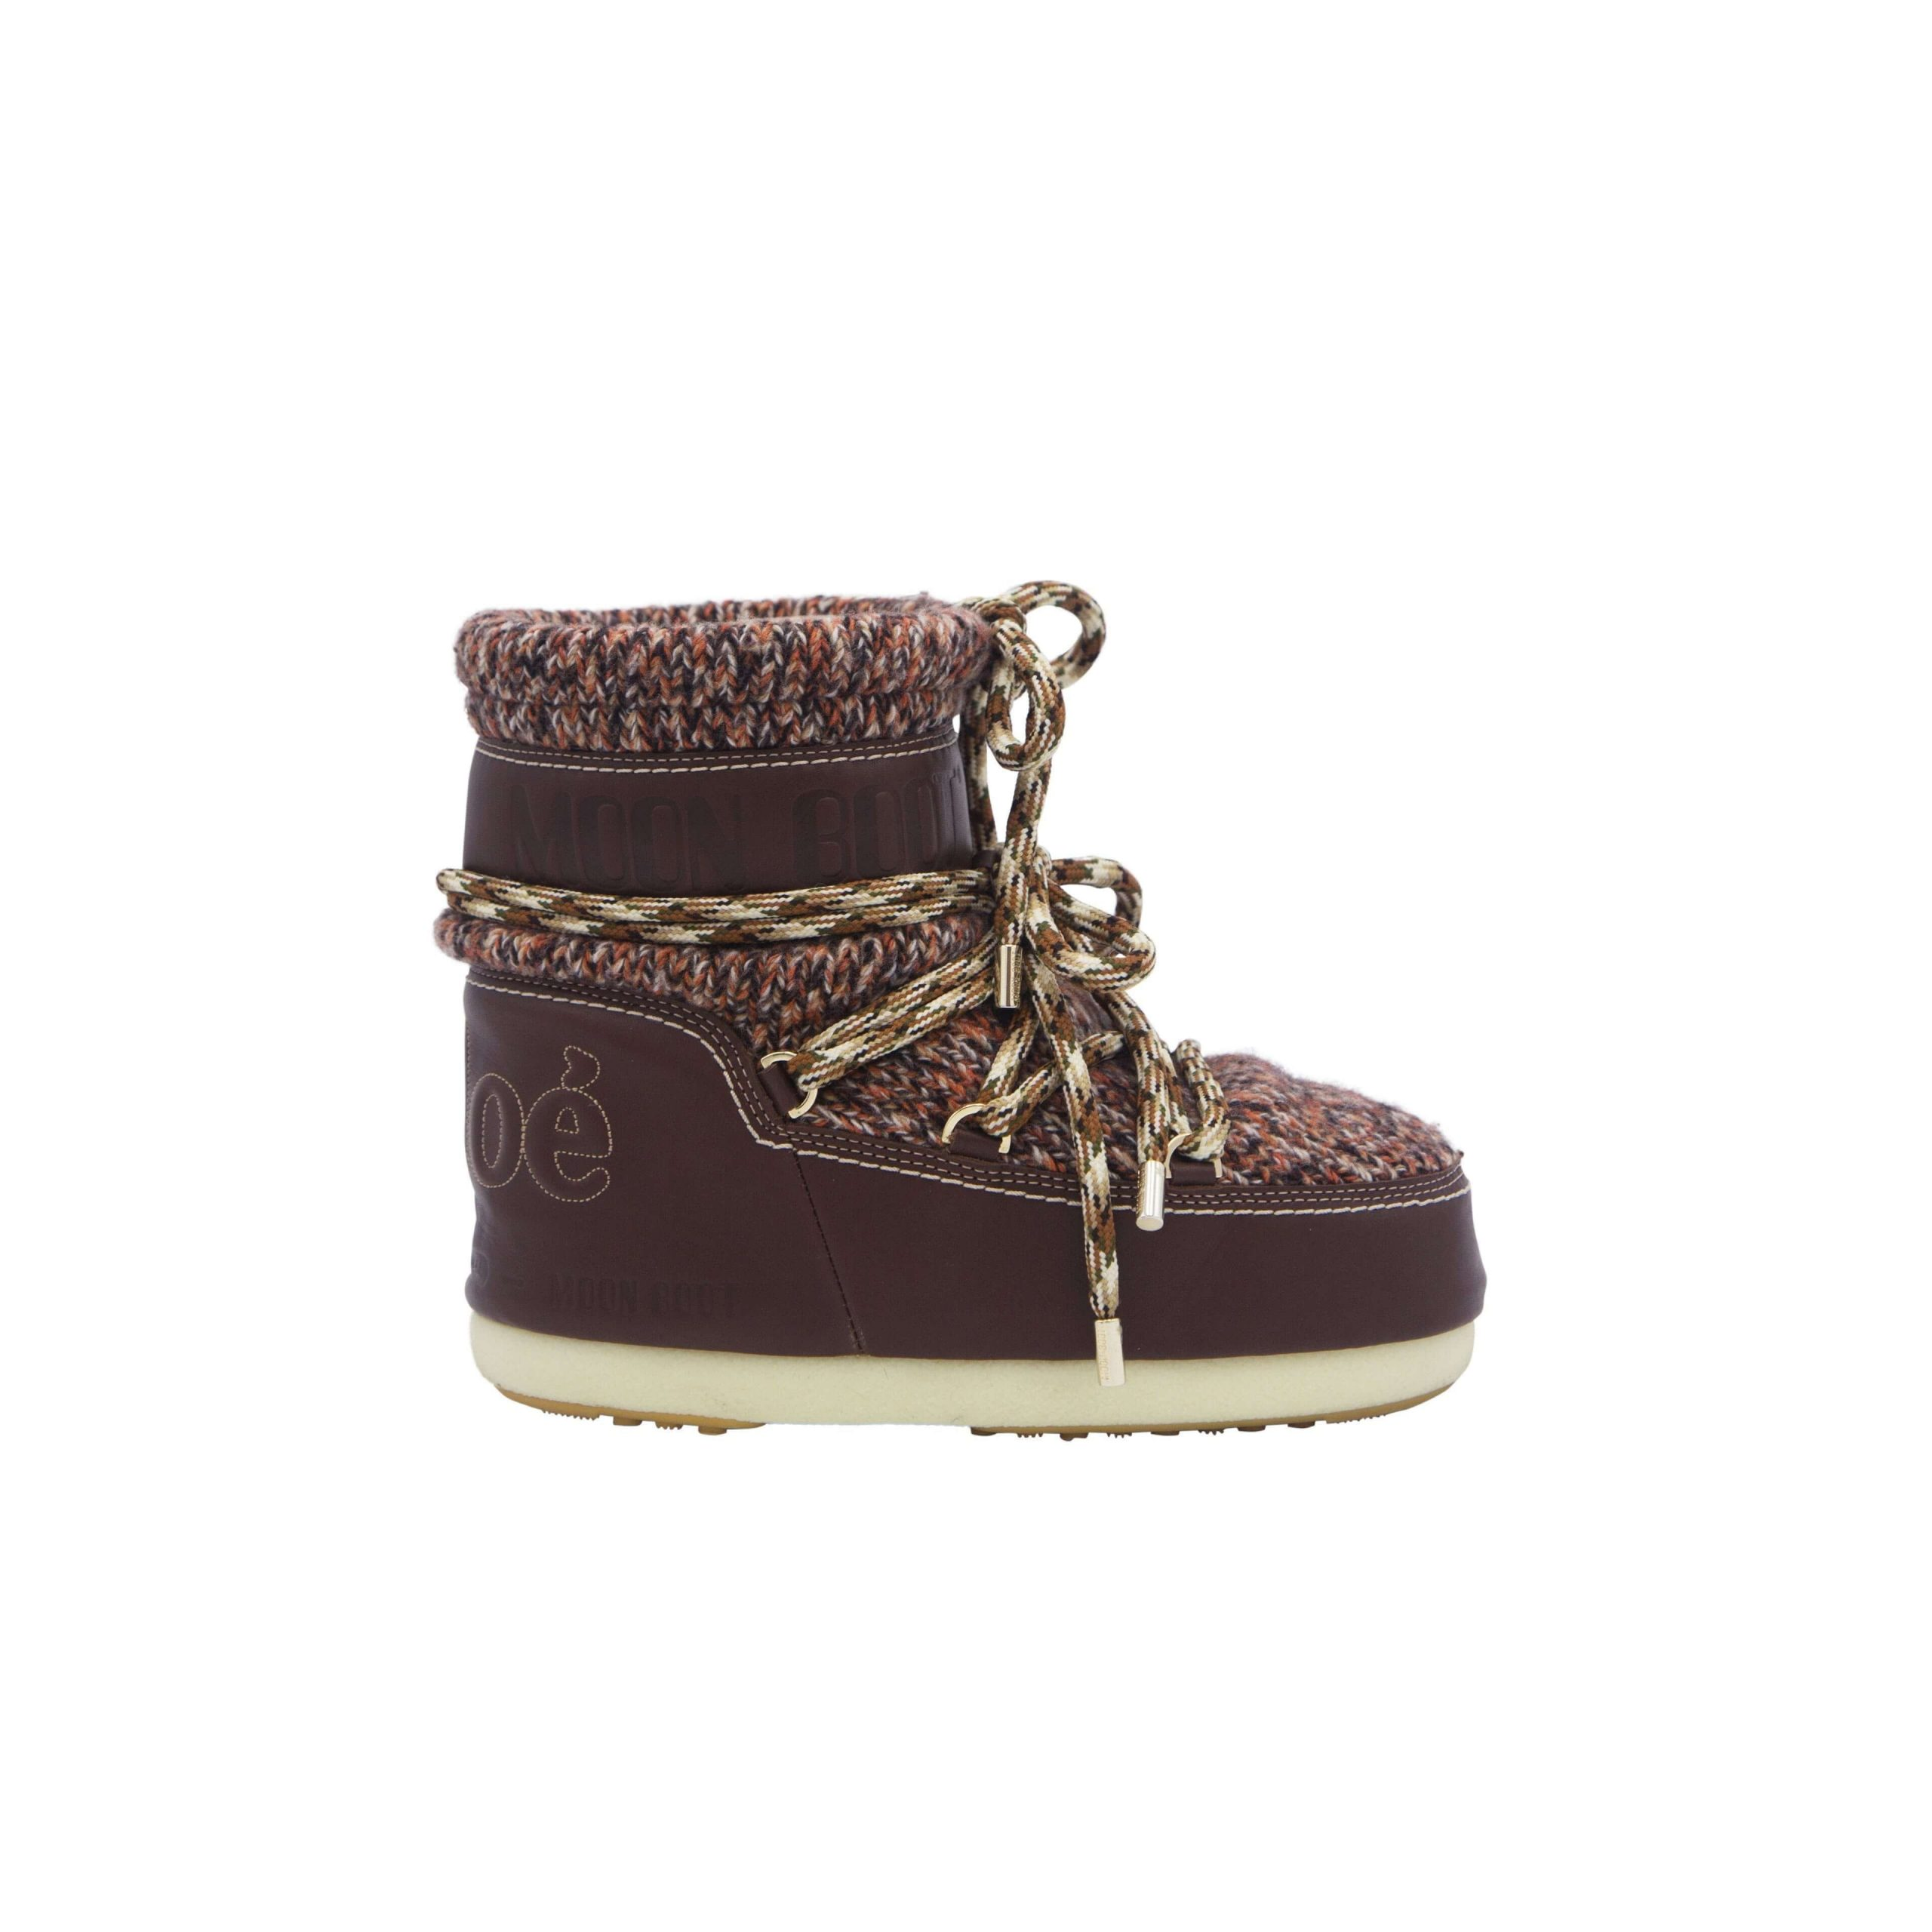 1633642259 chloe fall winter boots 2021